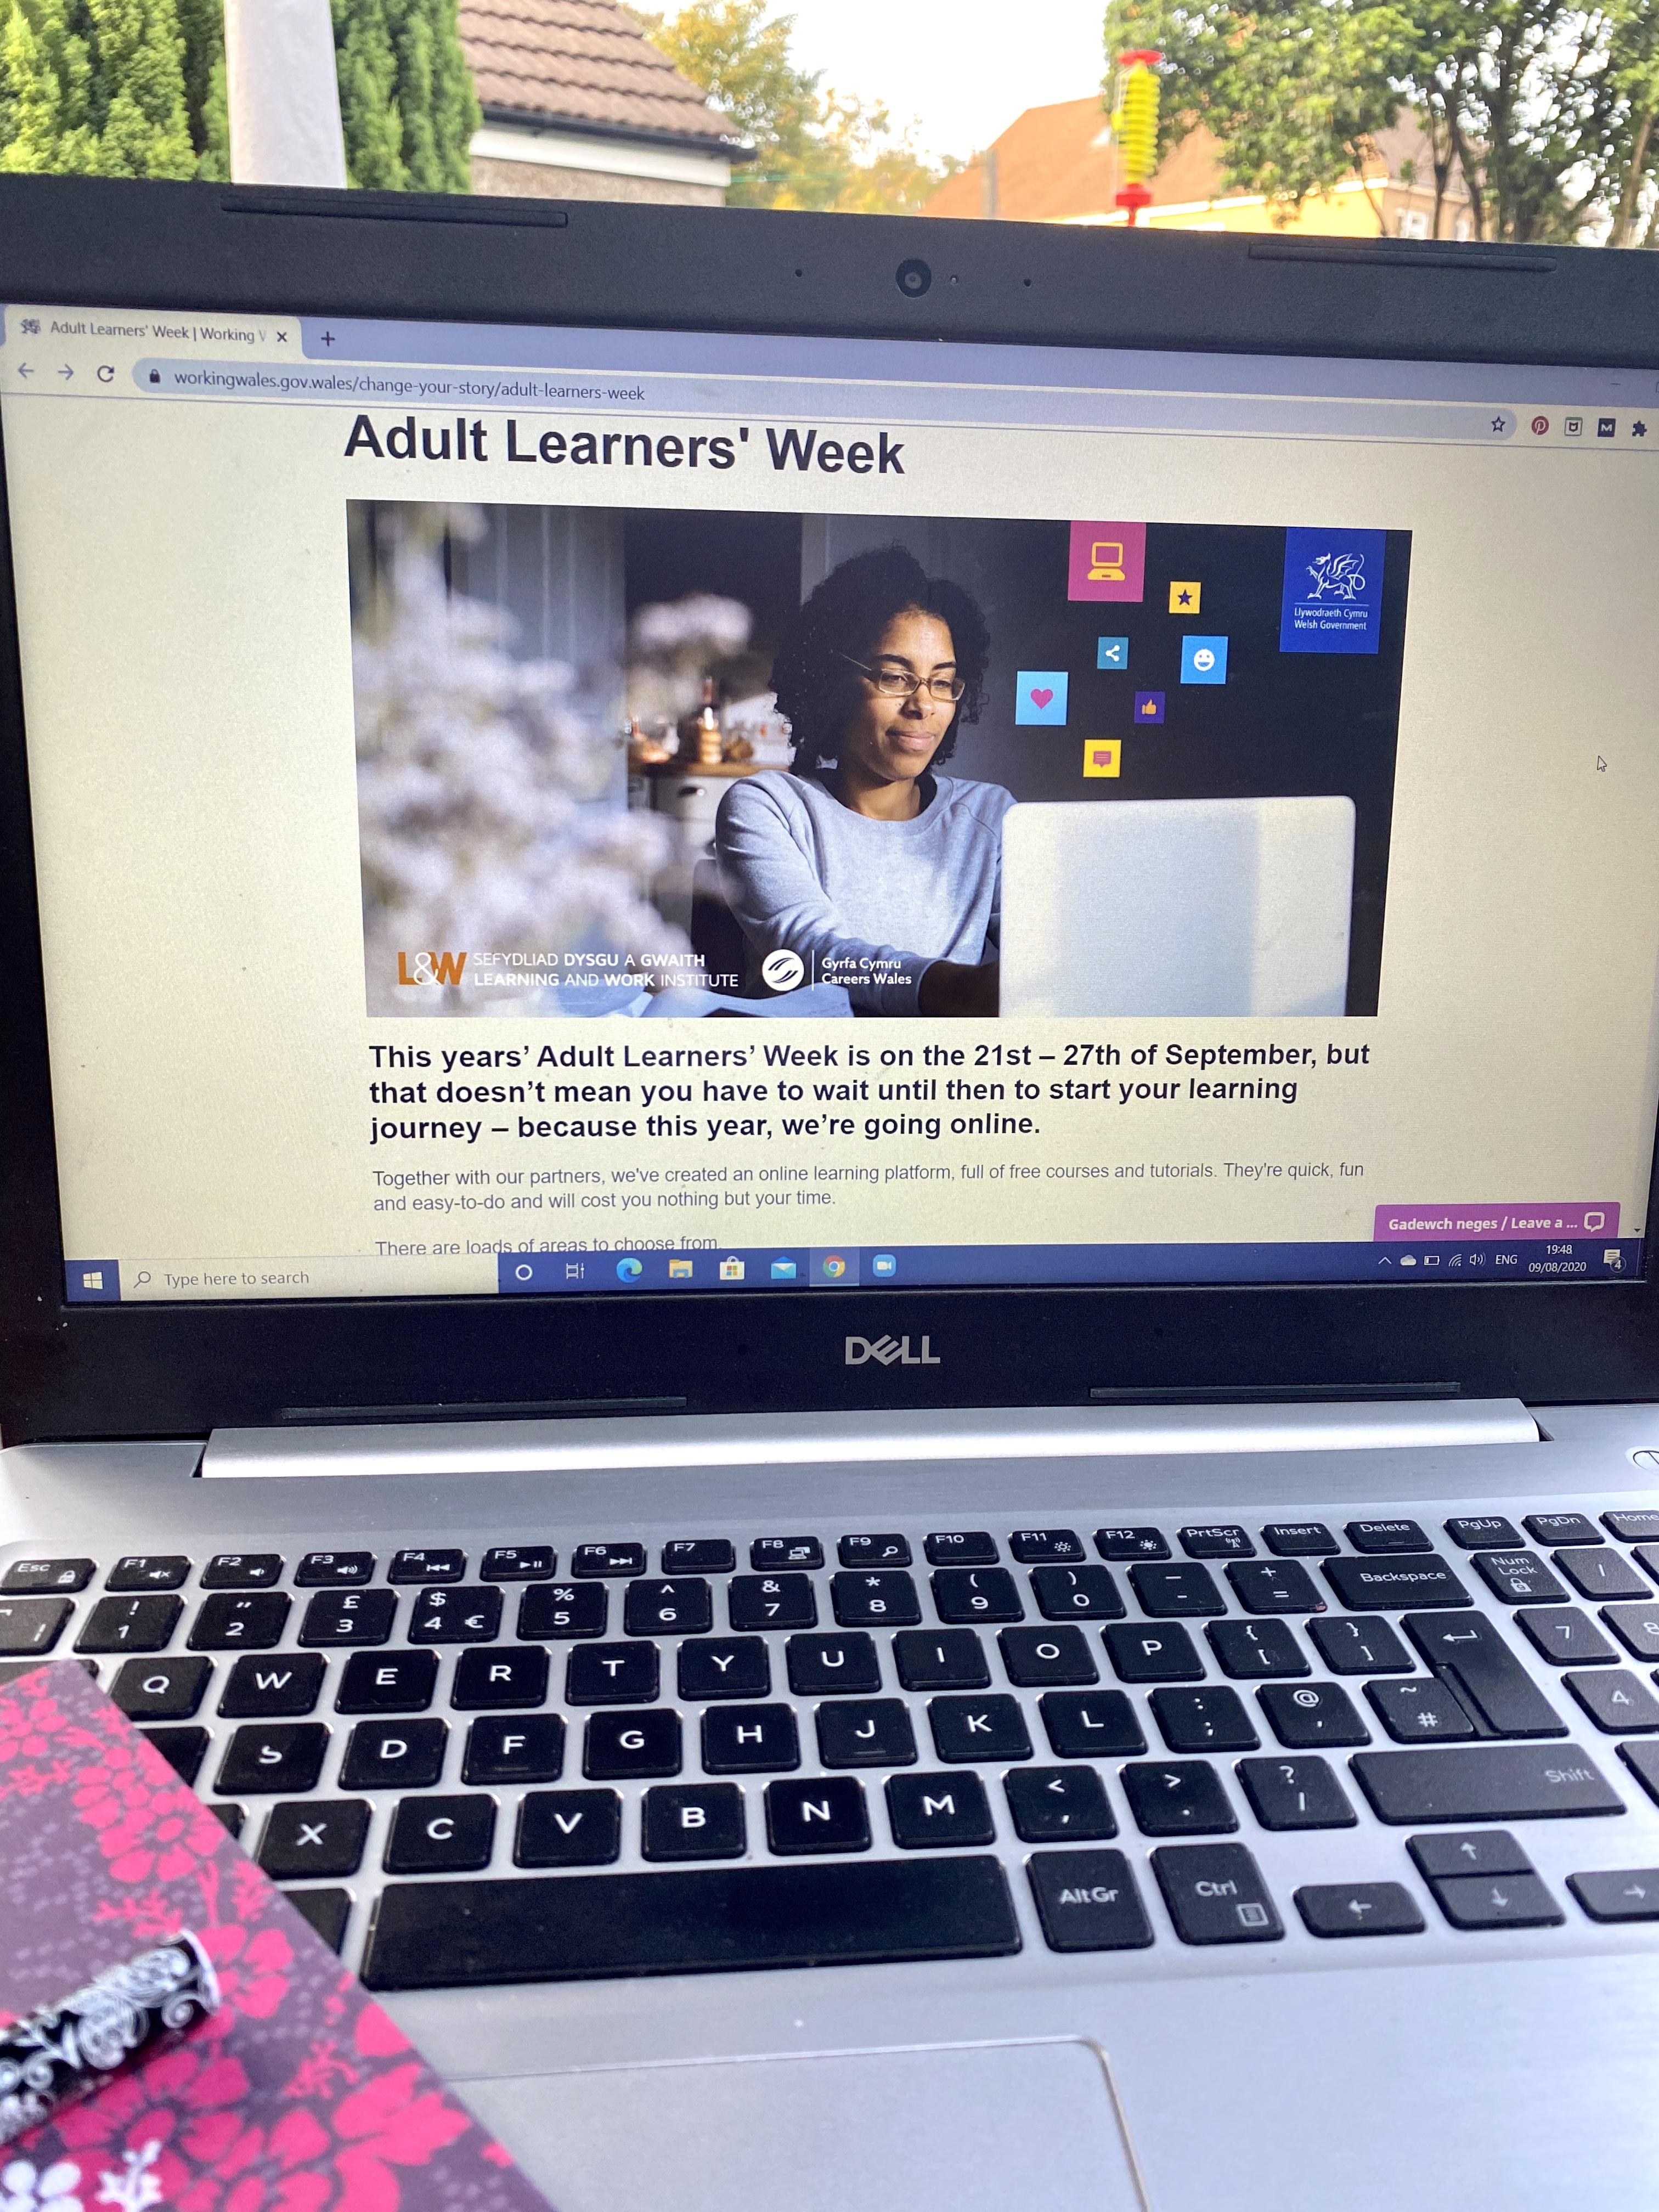 Cardiff Mummy Says Adult Learners' Week 2020